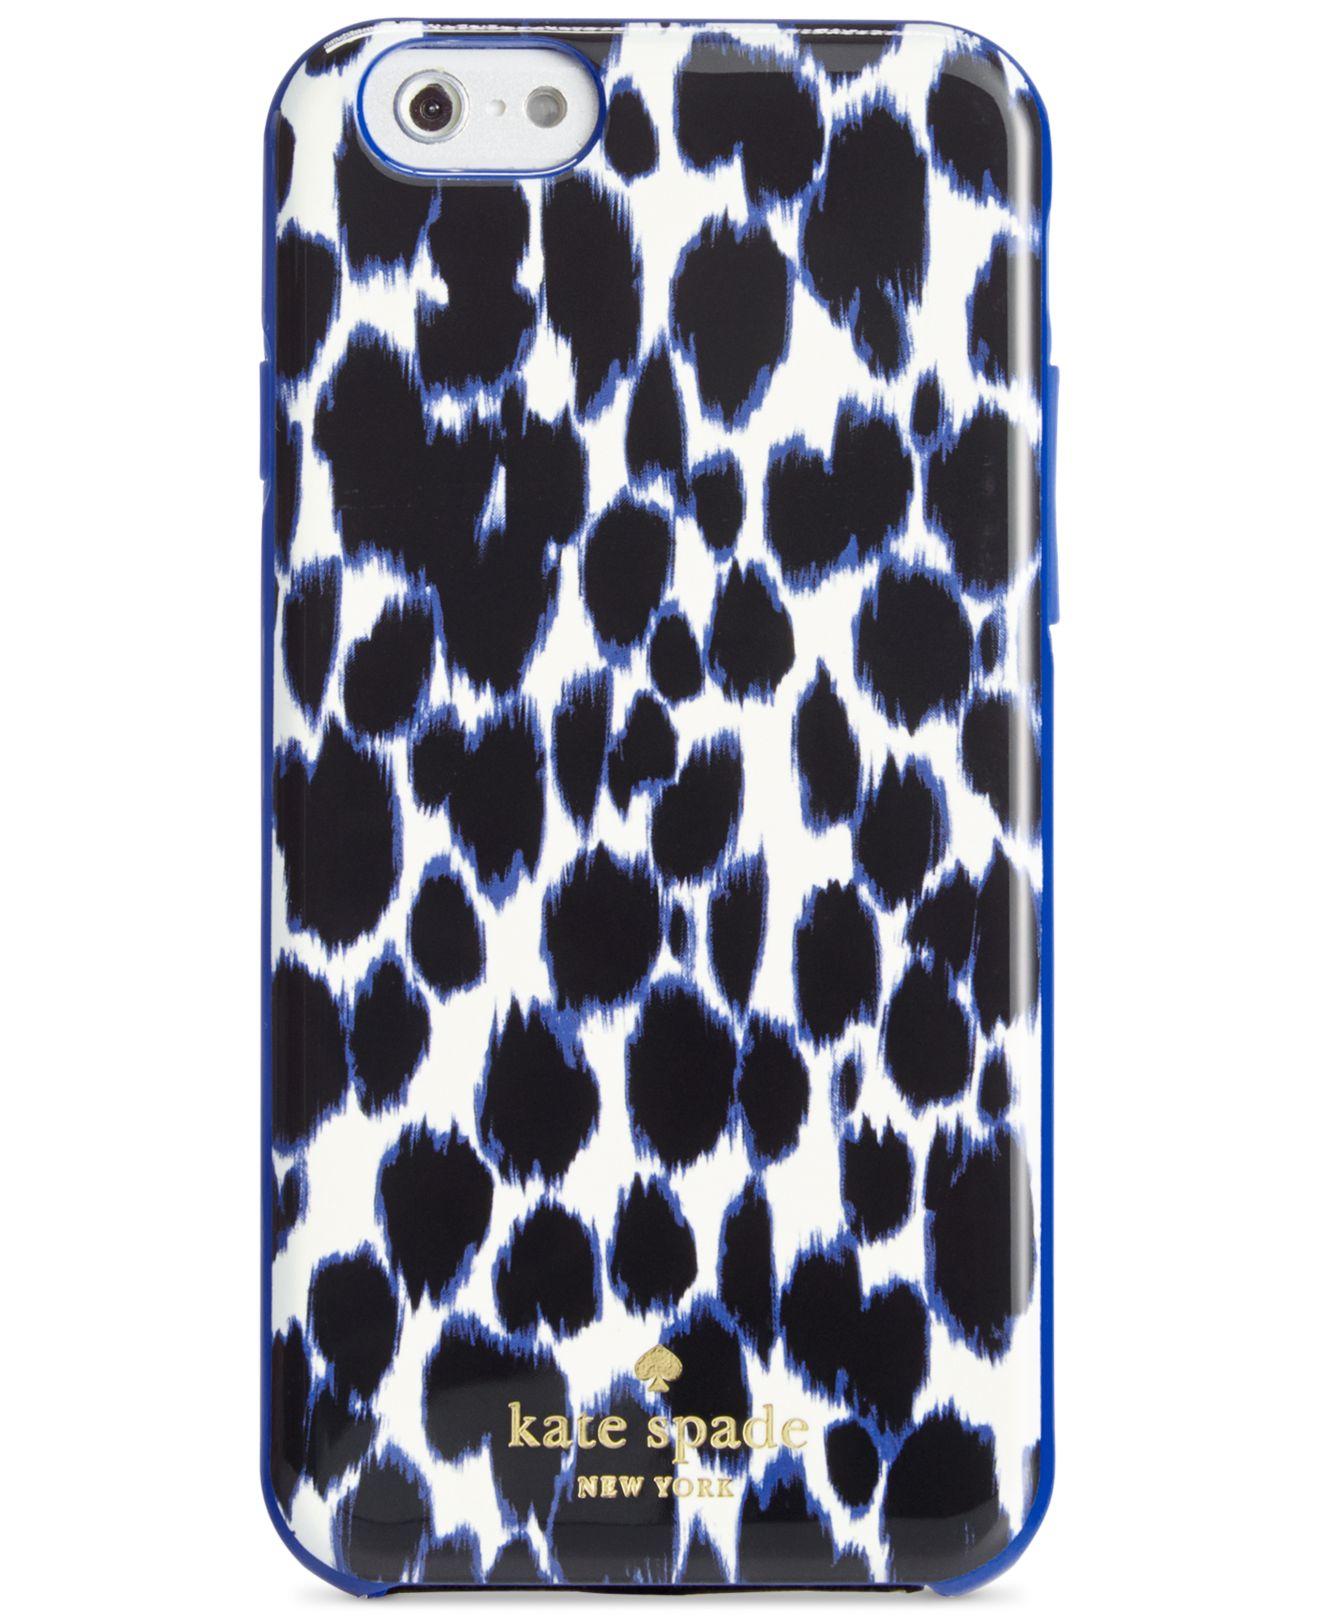 Kate Spade Leopard Iphone S Case